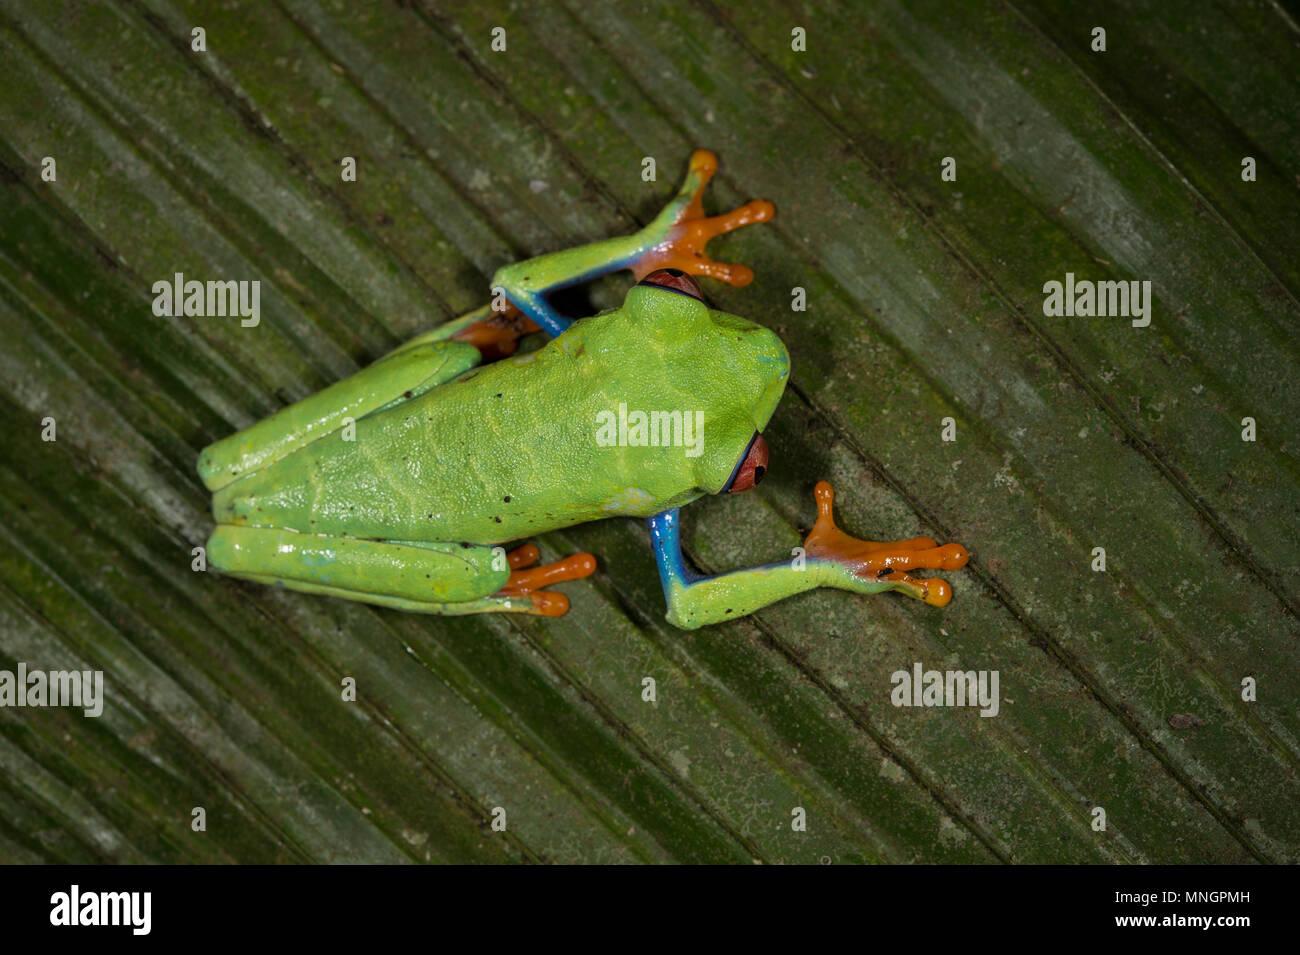 Red-eyed Leaf Frosch, Agalychnis callidryas, Hylidae, Manuel Antonio National Park, Costa Rica, Centroamerica Stockbild